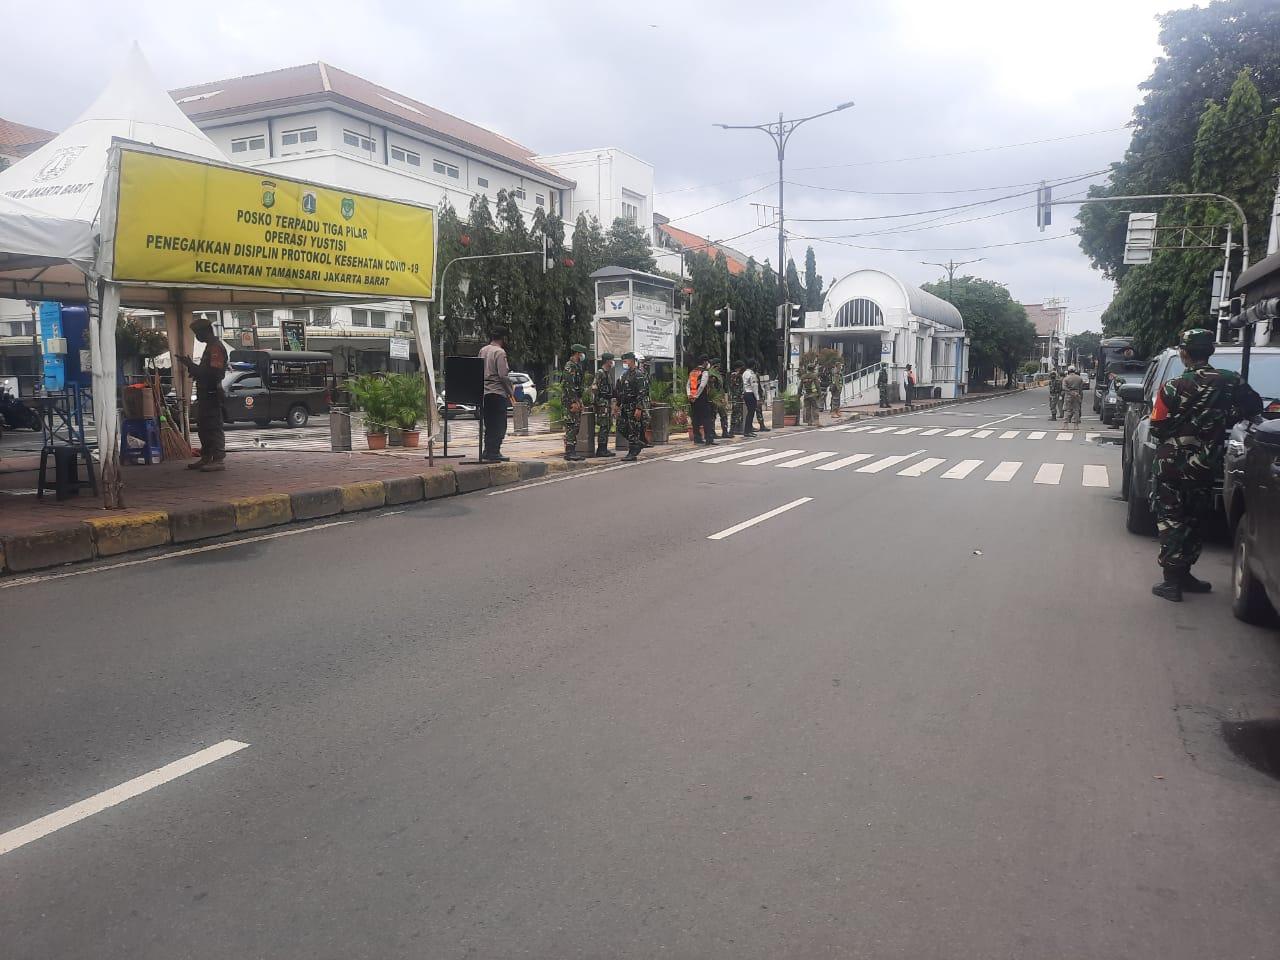 Danrem 052/Wkr, Tinjau Pelaksanaan Ops PPKM di Wilayah Jakbar